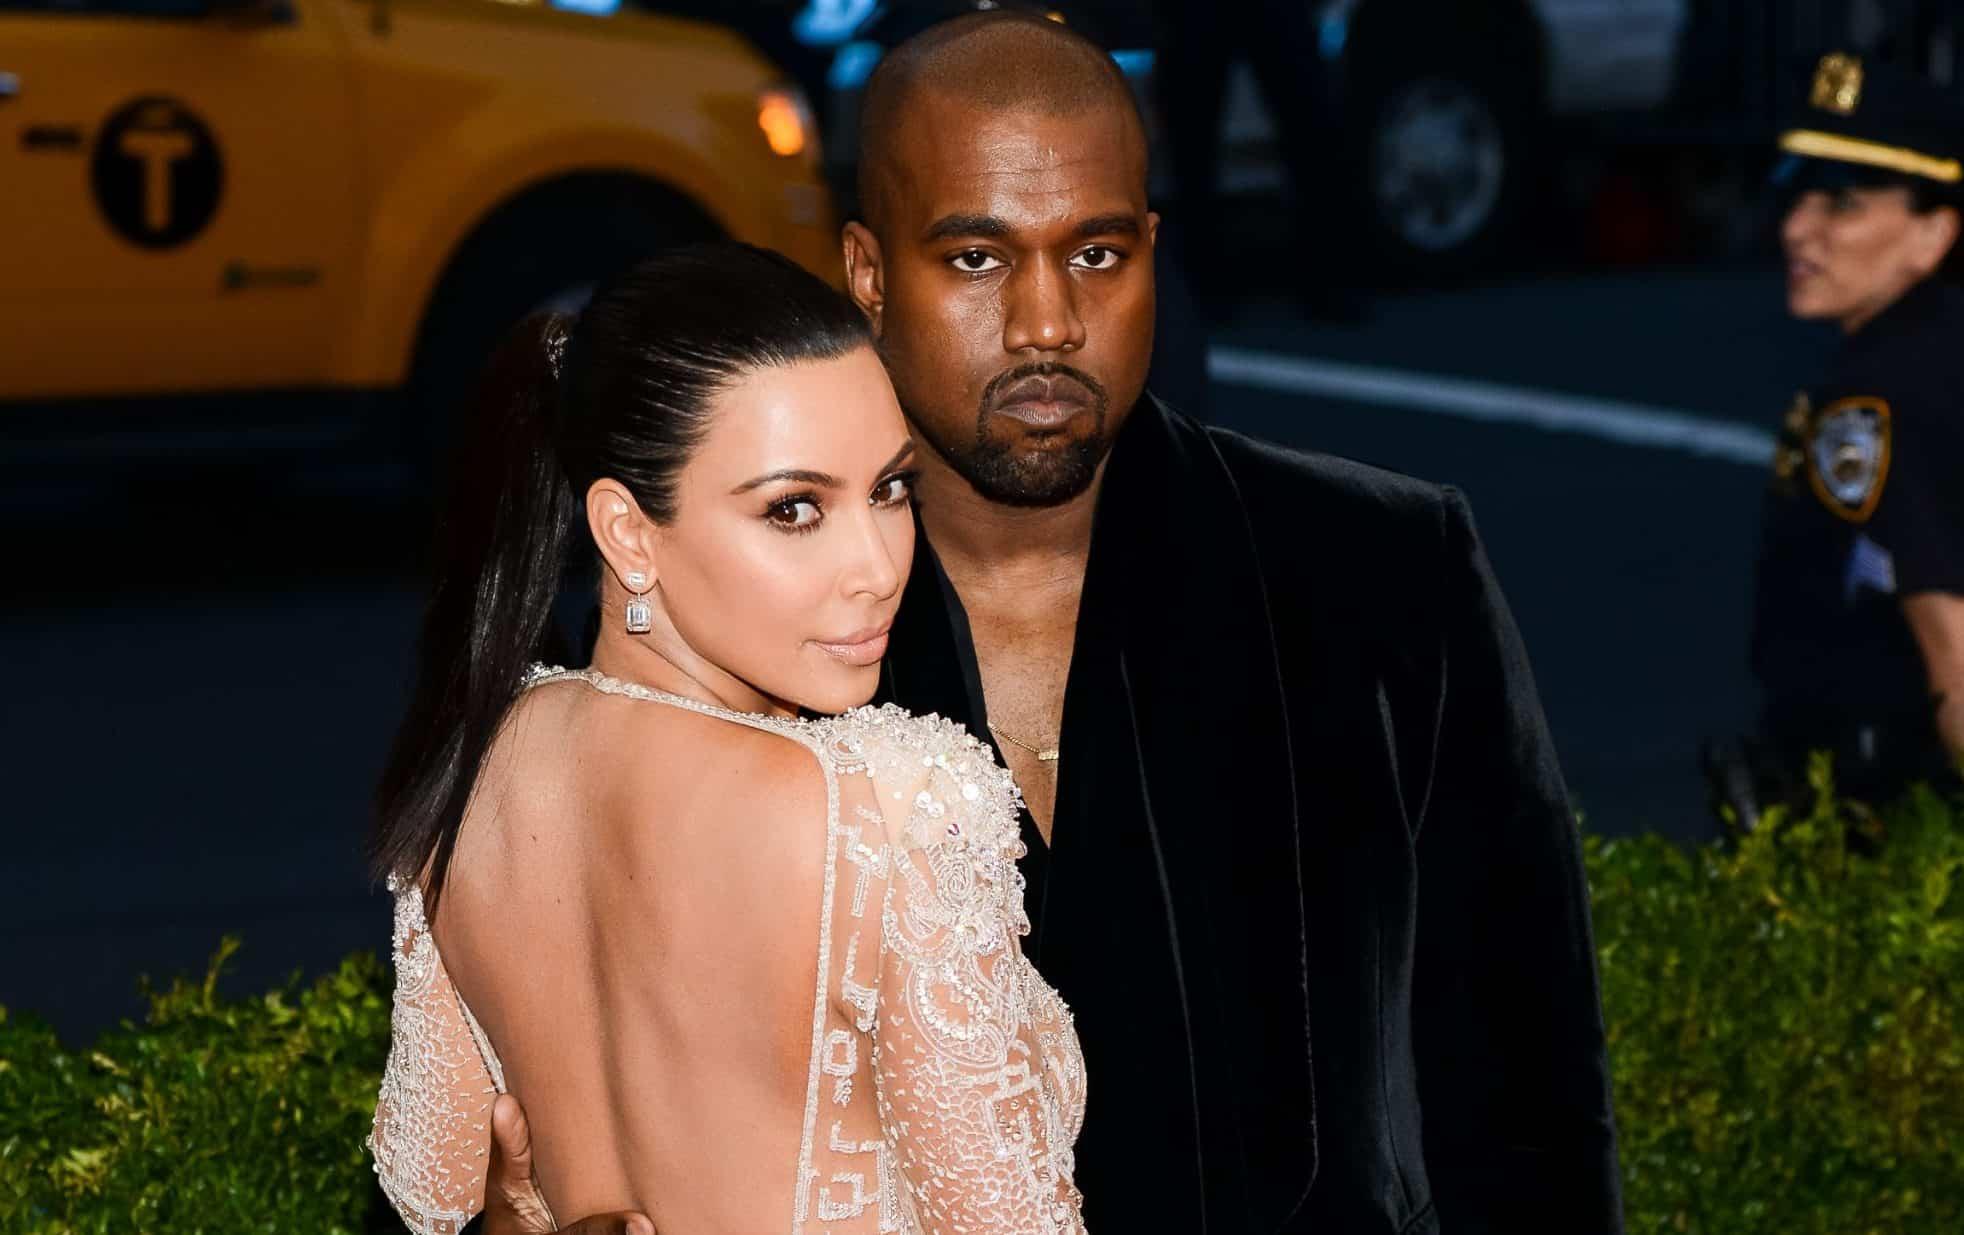 Kim Kardashian and Kanye West (Photo: Sky Cinema/Shutterstock.com)